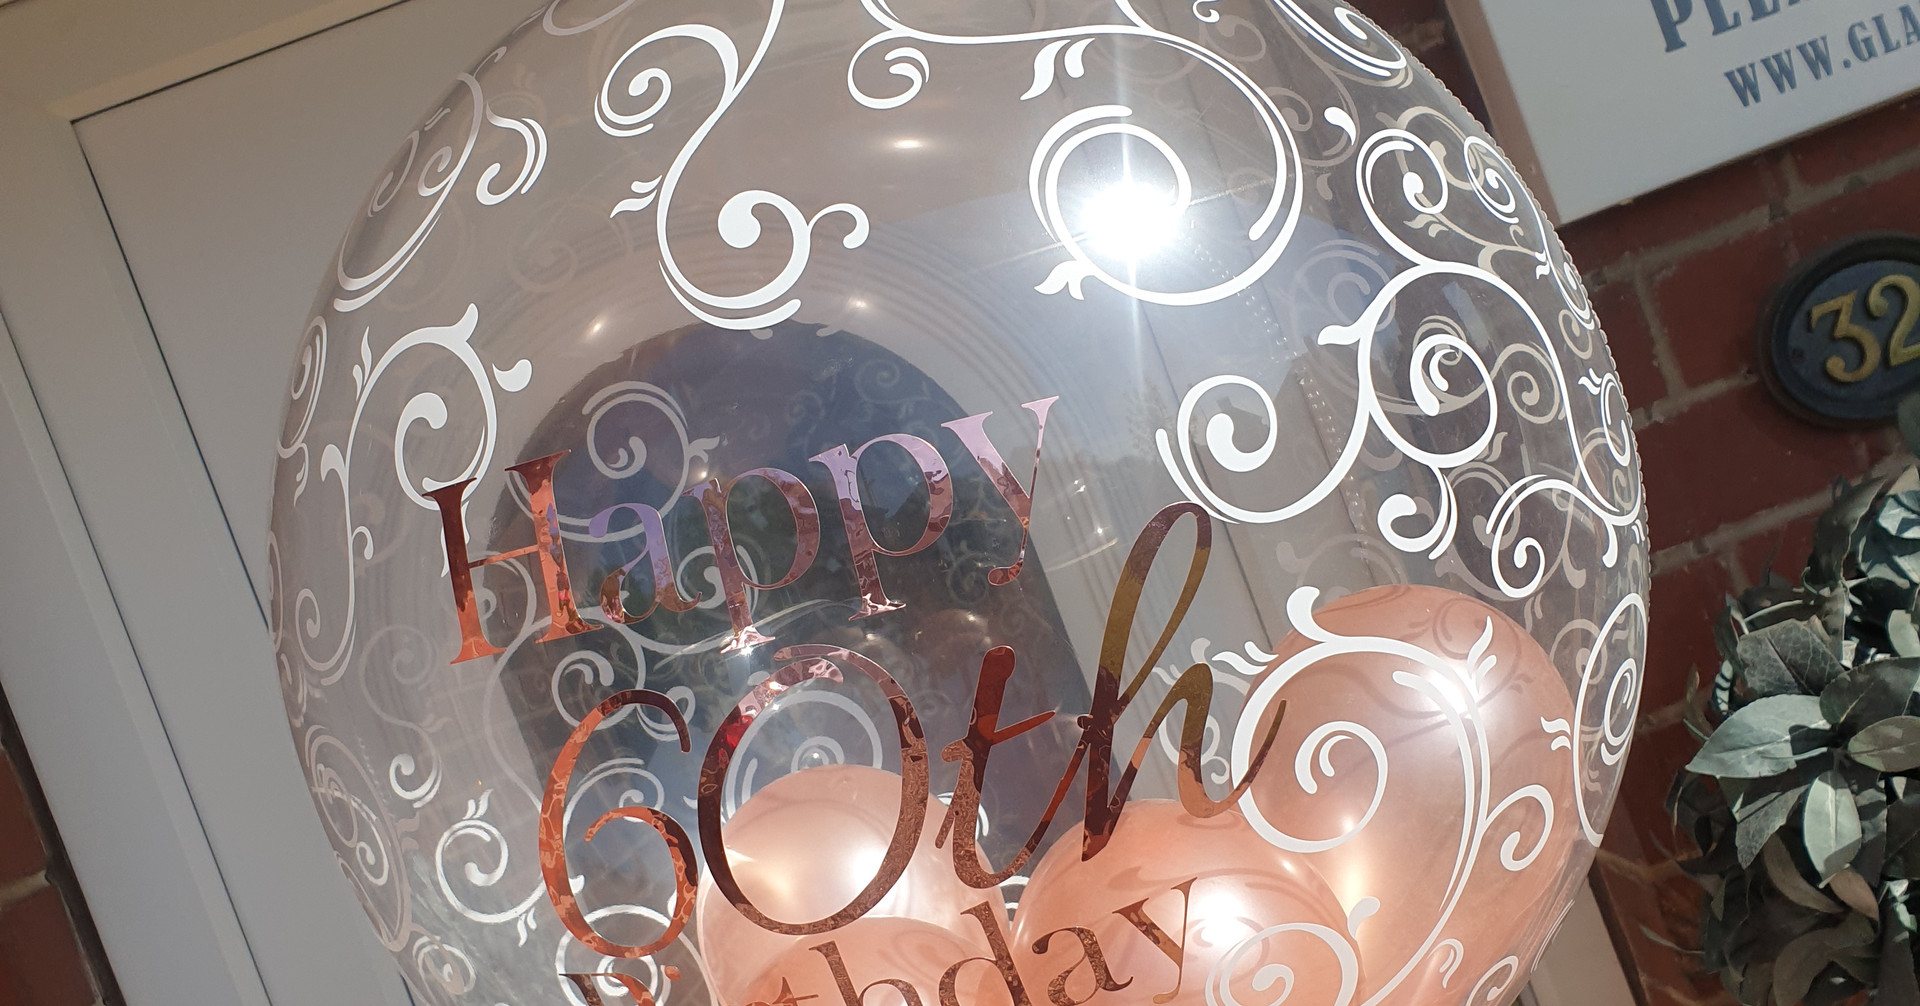 Script print rose gold birthday bubble